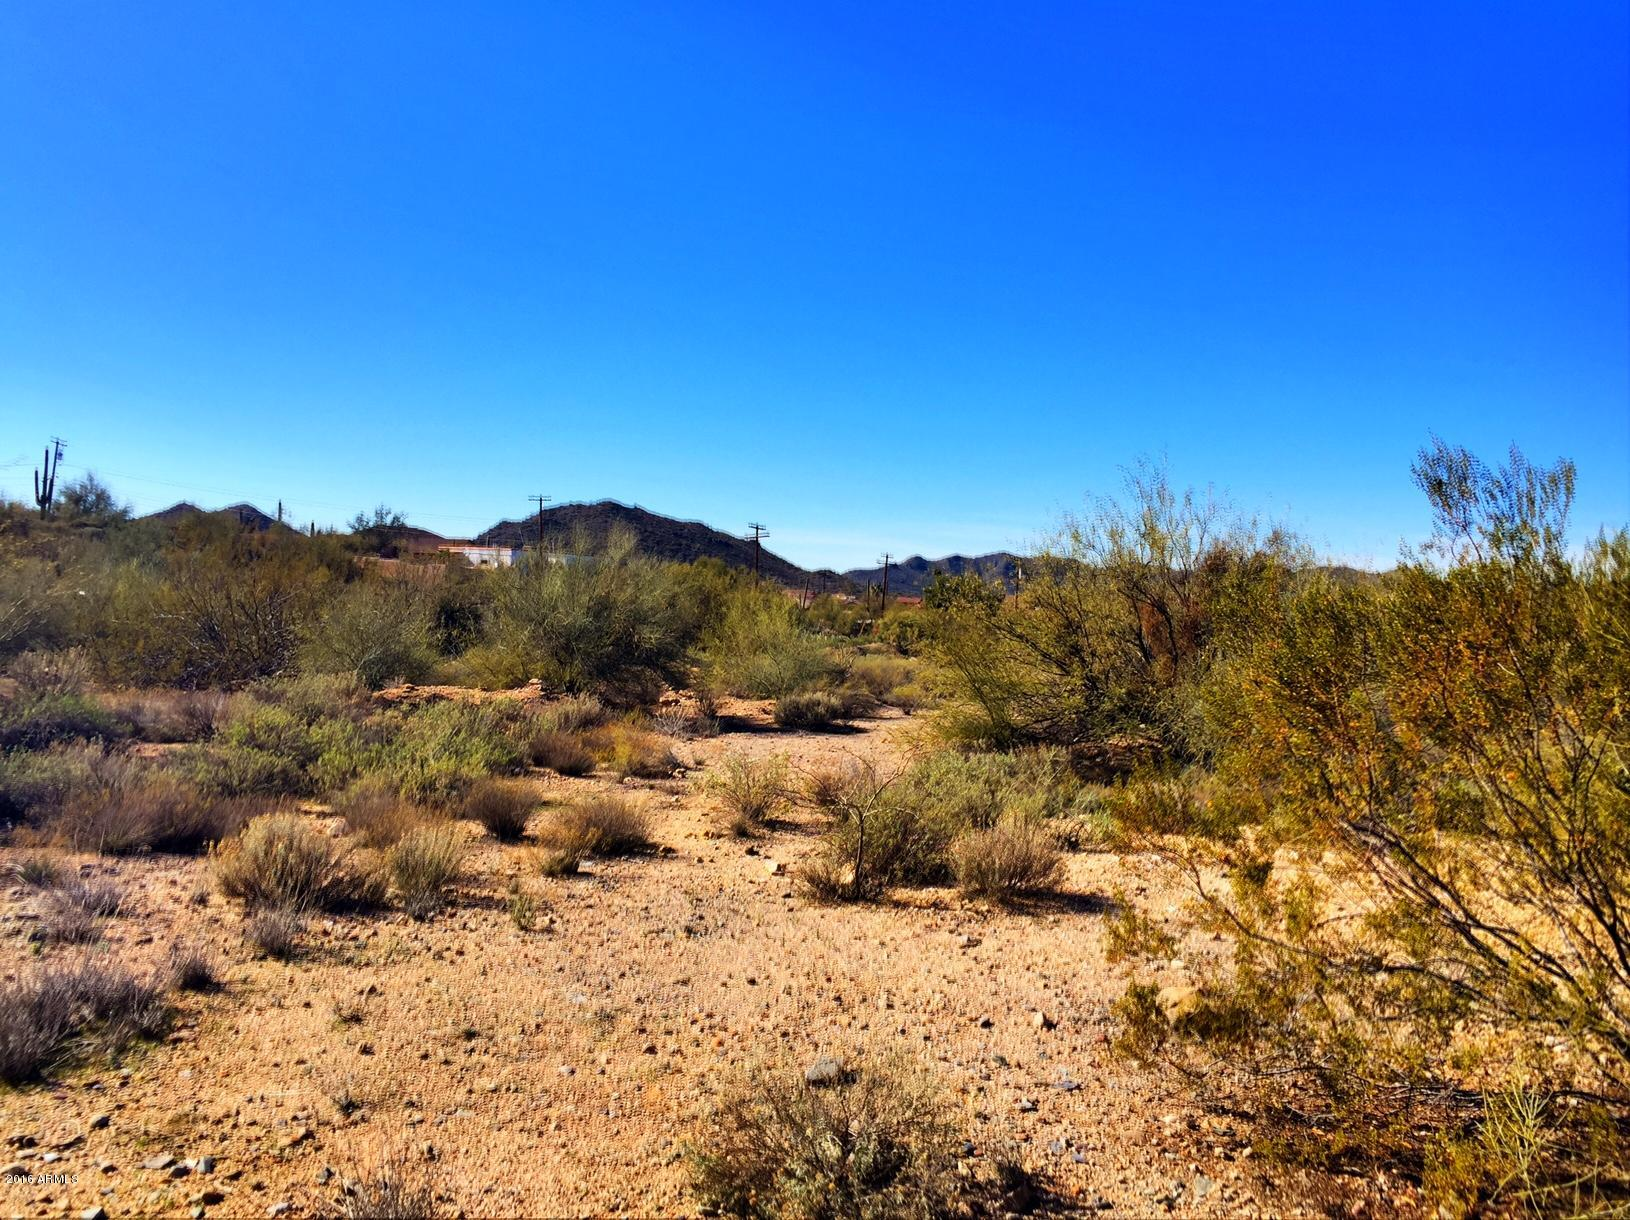 000 N School House Road, Cave Creek, Arizona 85331, ,Land,For Sale,000 N School House Road,5864997